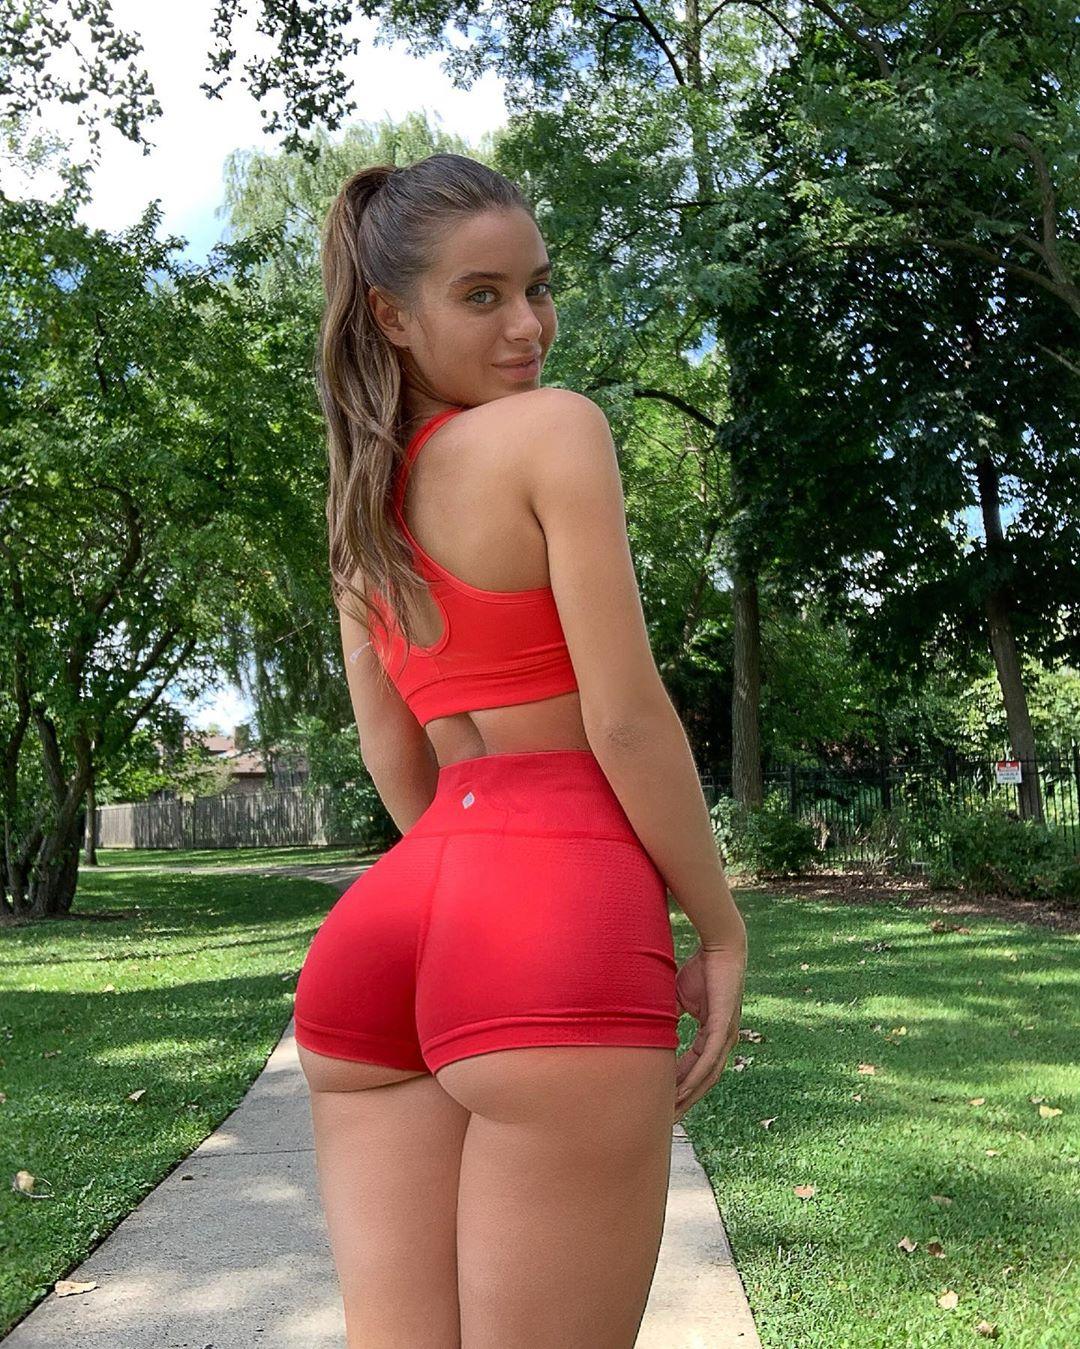 Lana rhoades instagra